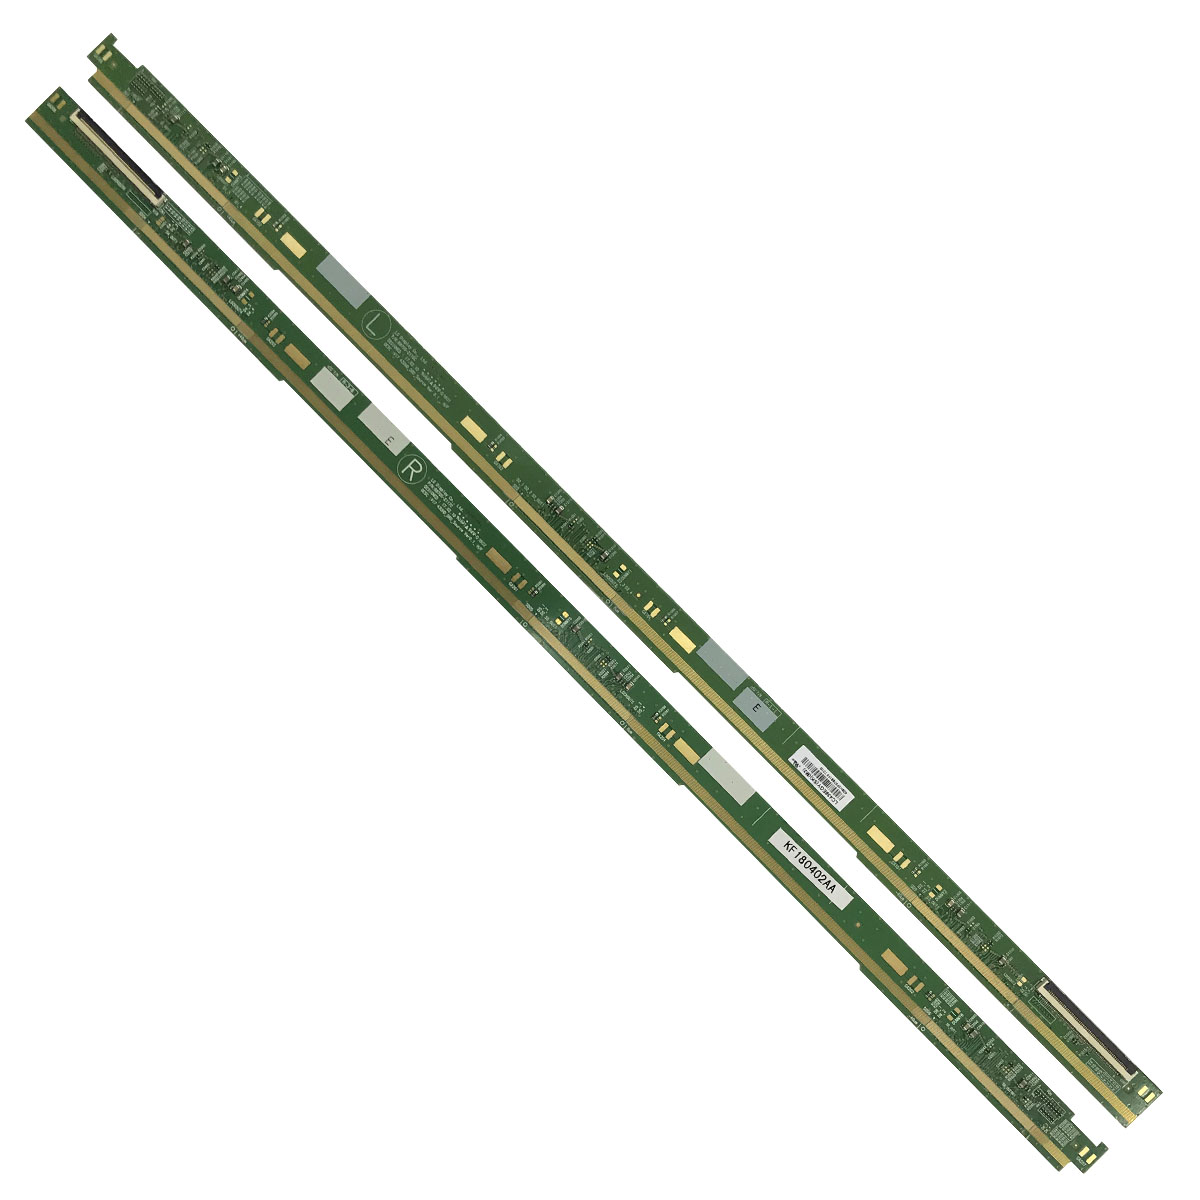 Планки матрицы 6870S-2117C/6870S-2116C для DAEWOO U43V870VKE